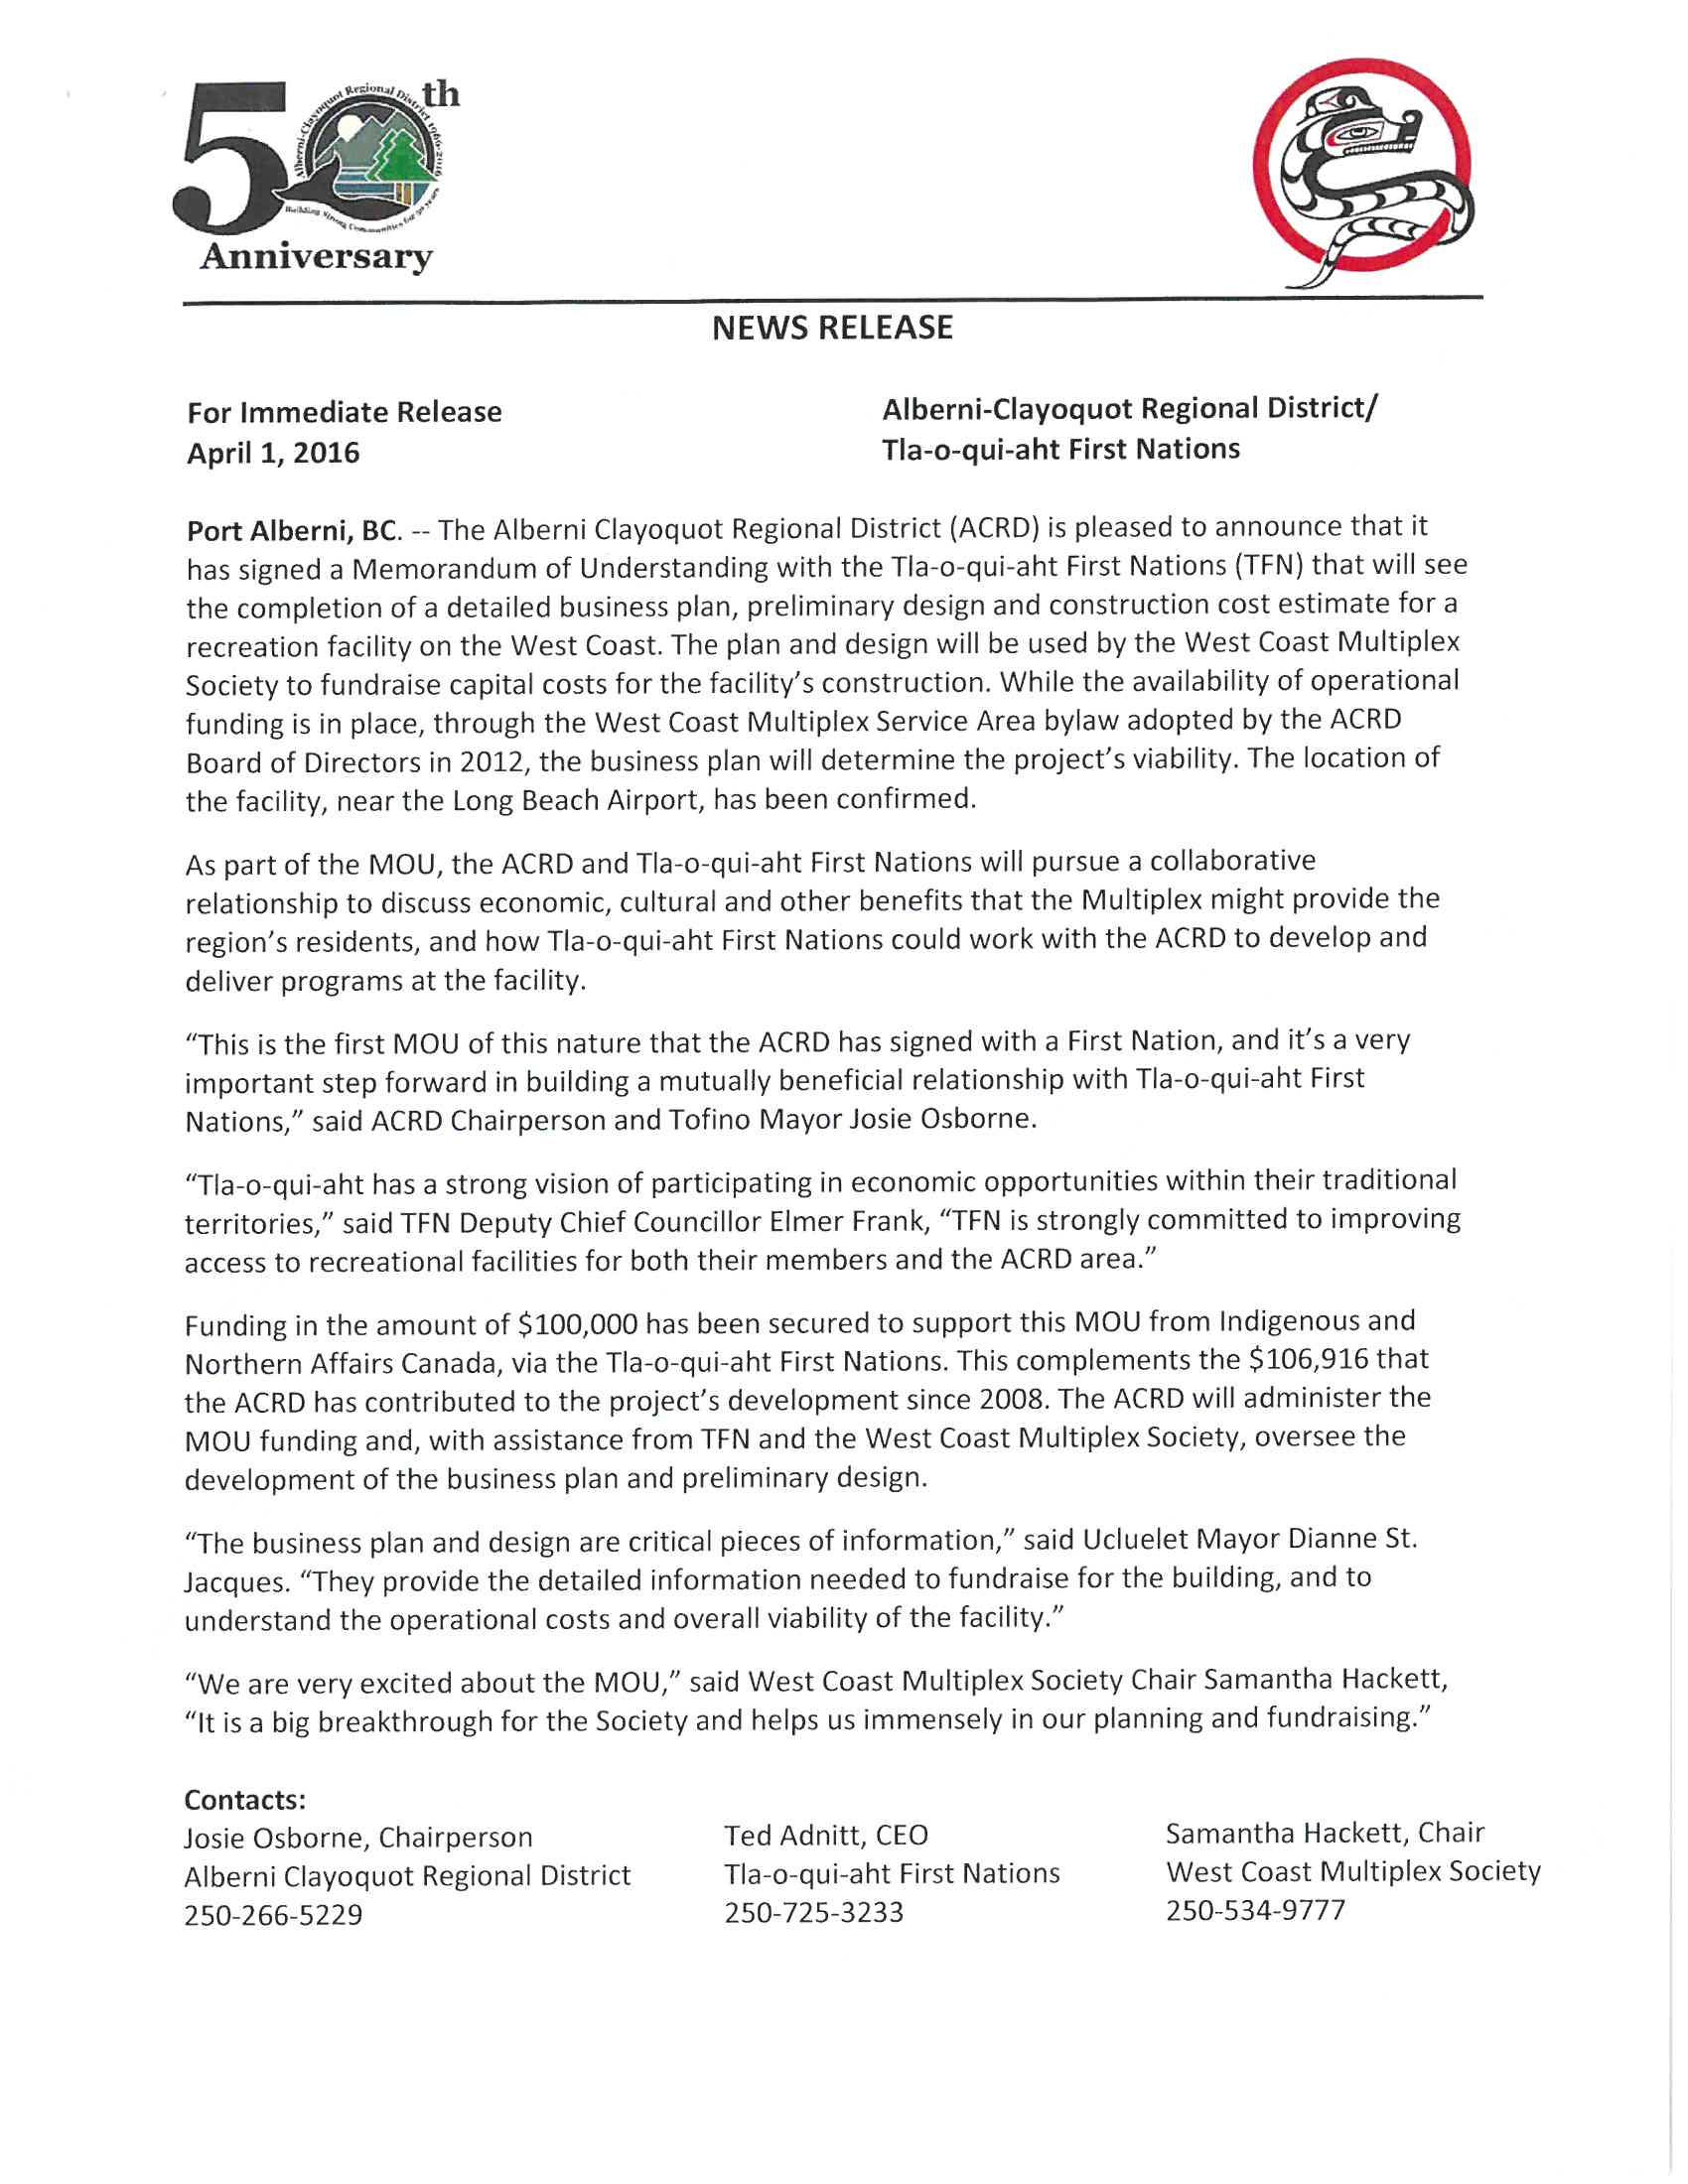 TFN Bulletin Apr 6-2016_Page_20.jpg